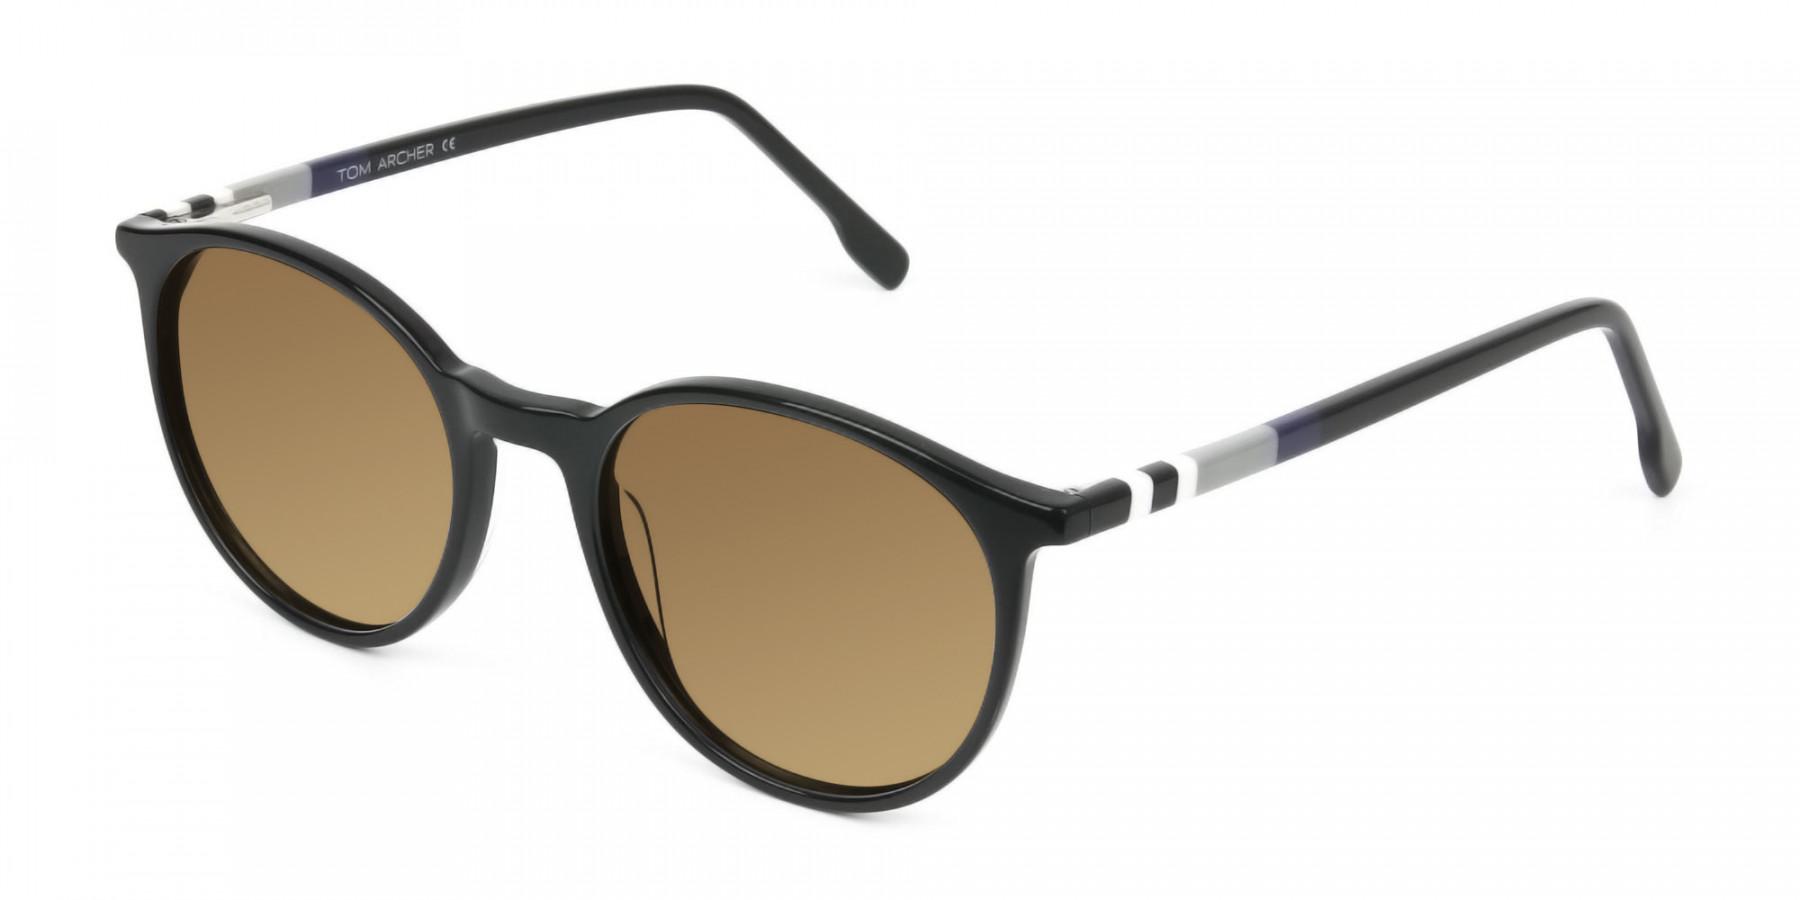 Dark-brown-black-round-sunglasses - 3